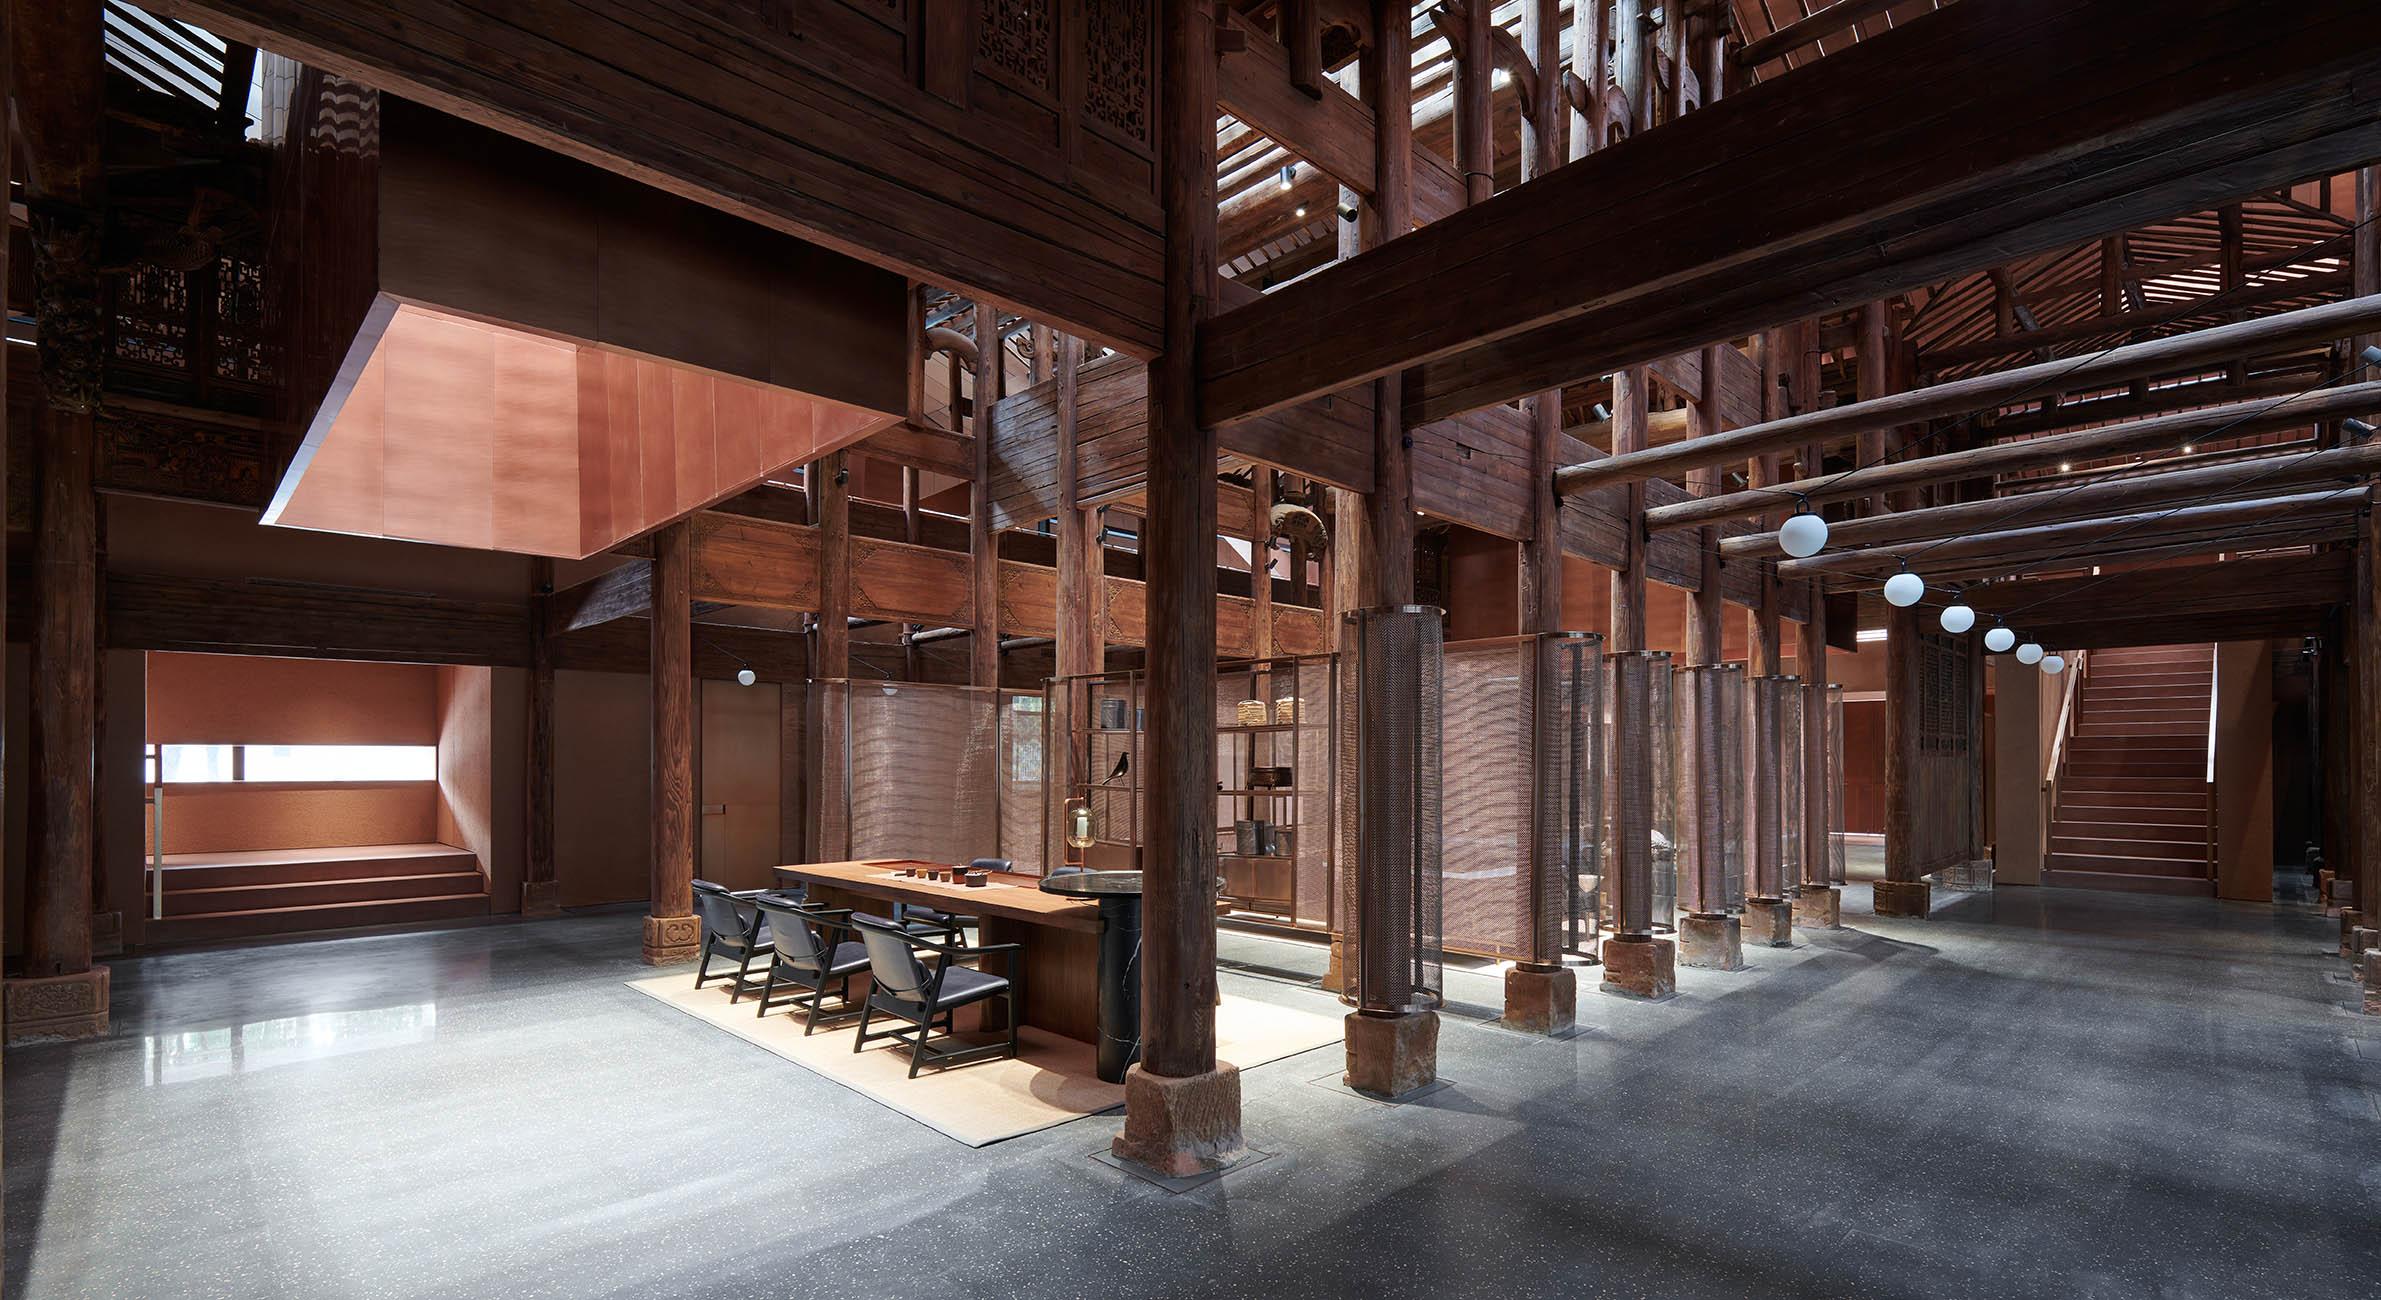 Fuzhou Teahouse Chen Hao